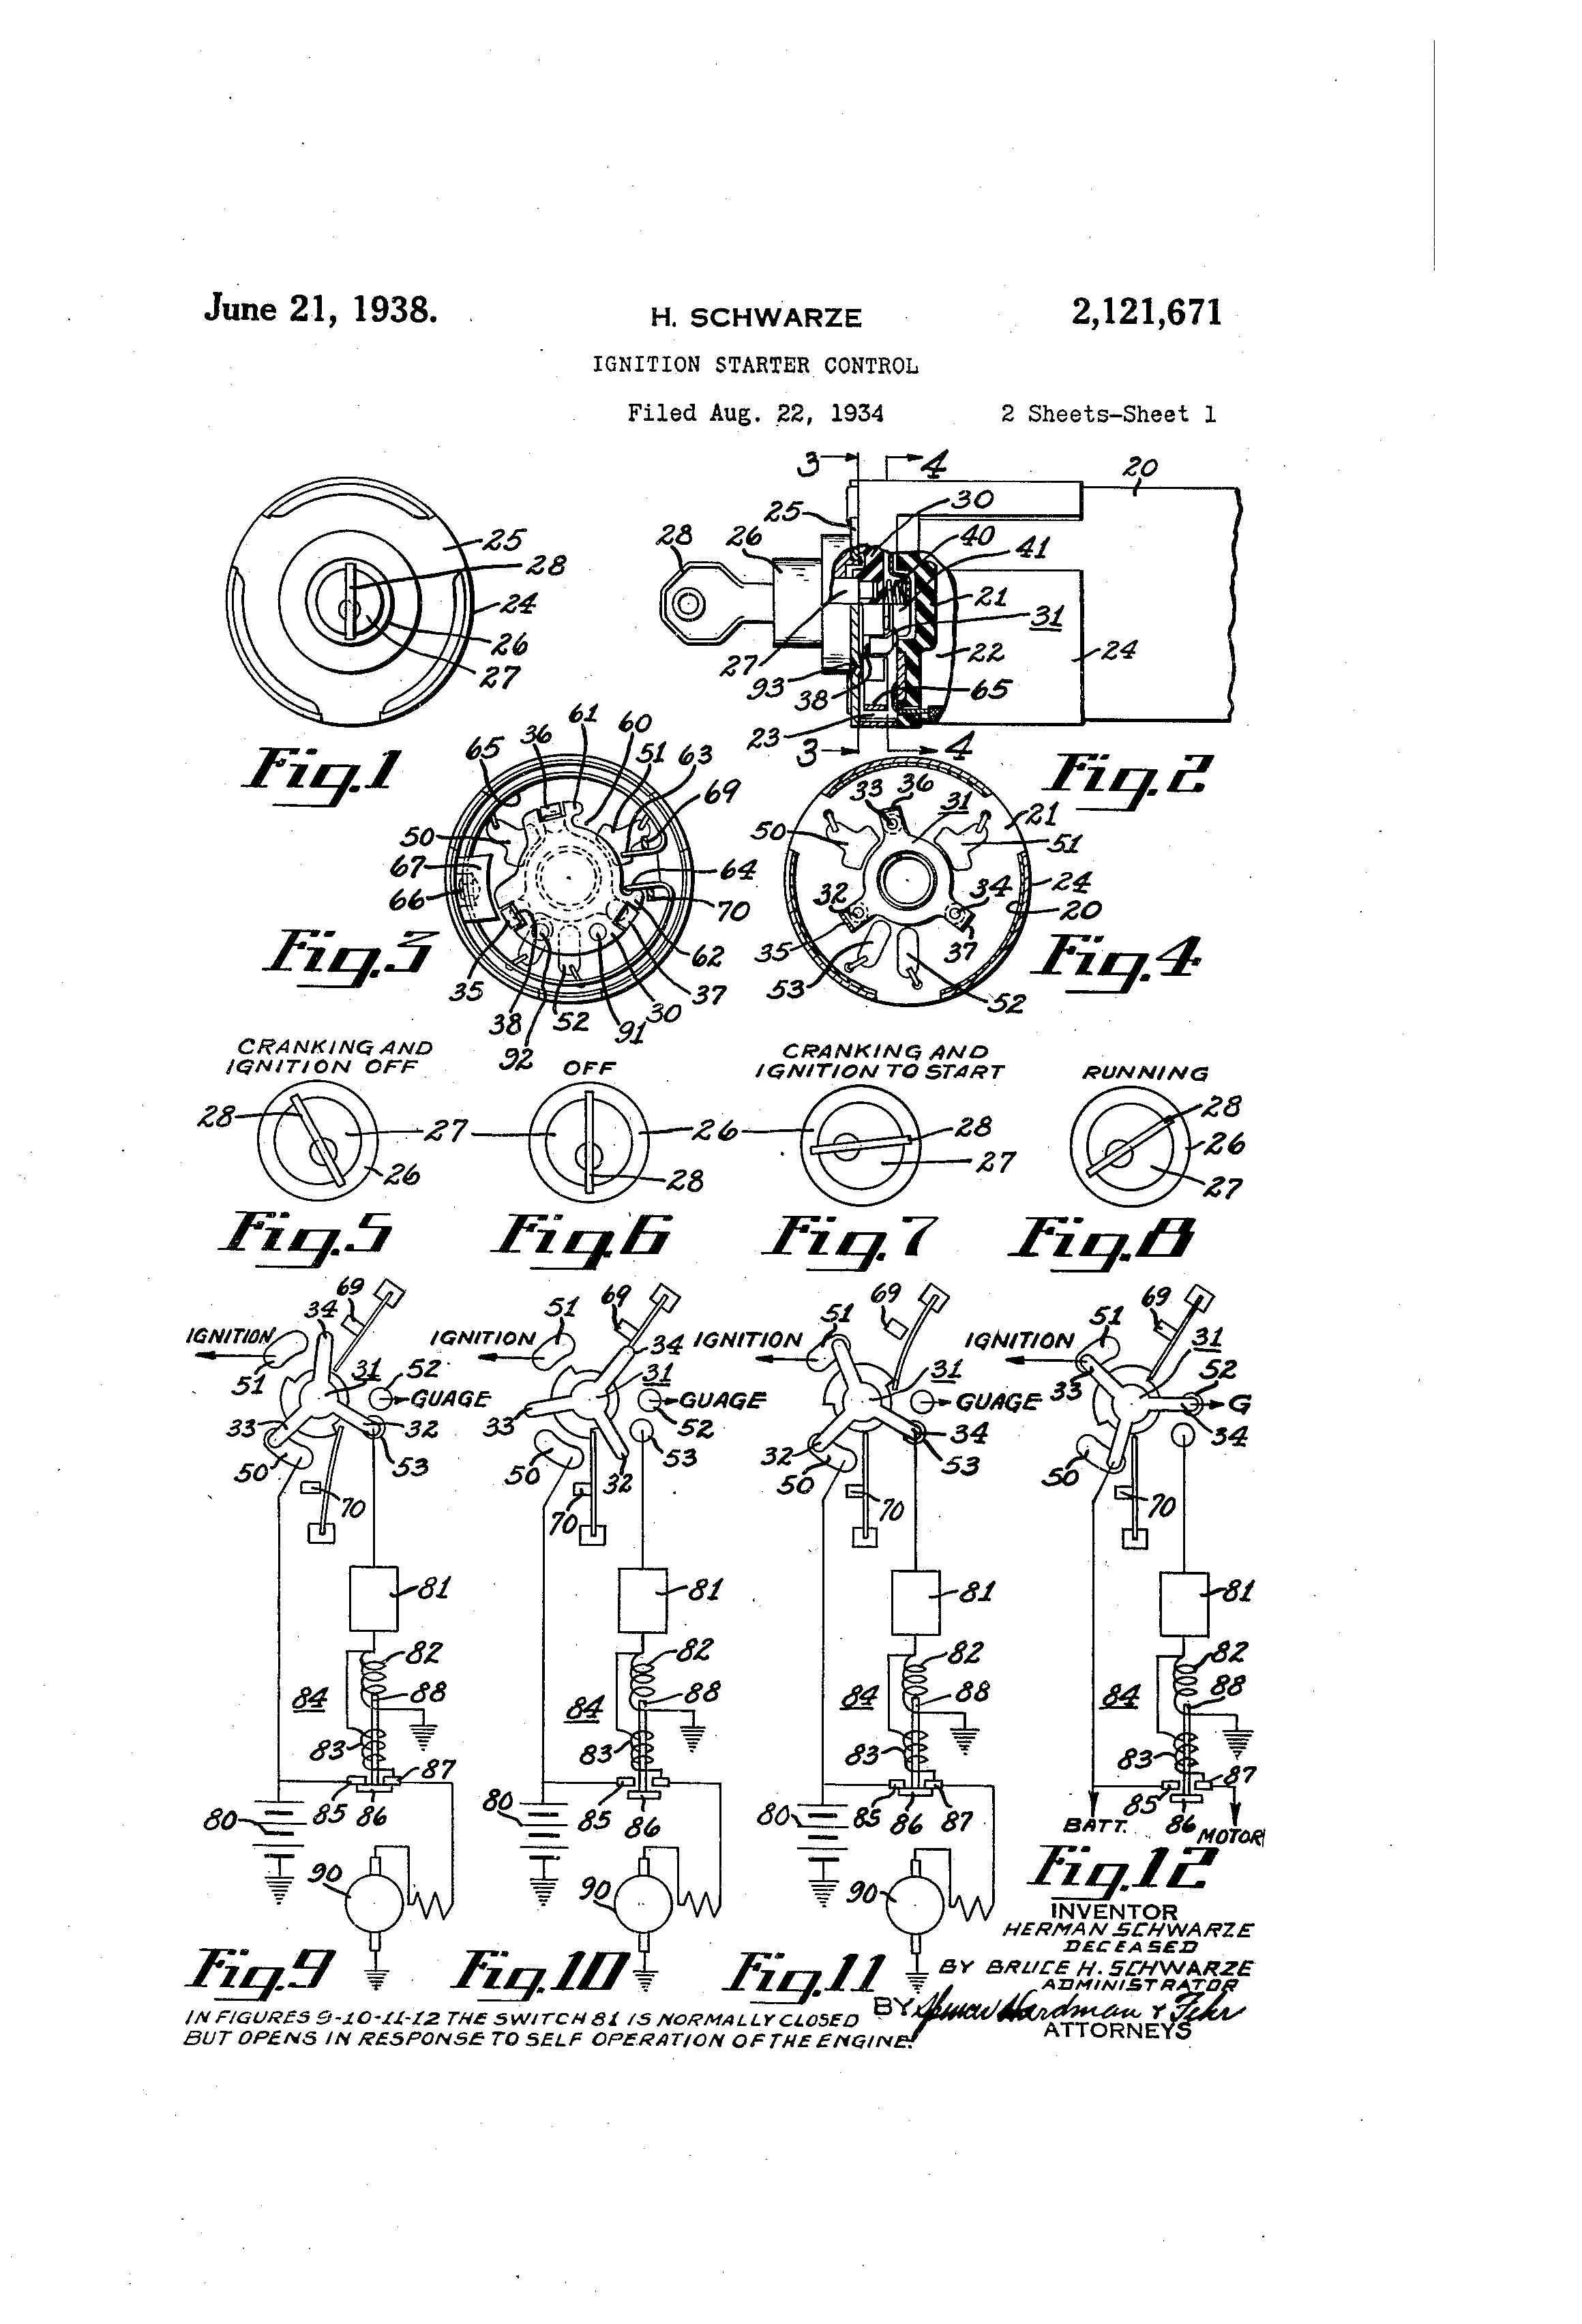 pollak 11 604ep 6 wiring diagram. Black Bedroom Furniture Sets. Home Design Ideas